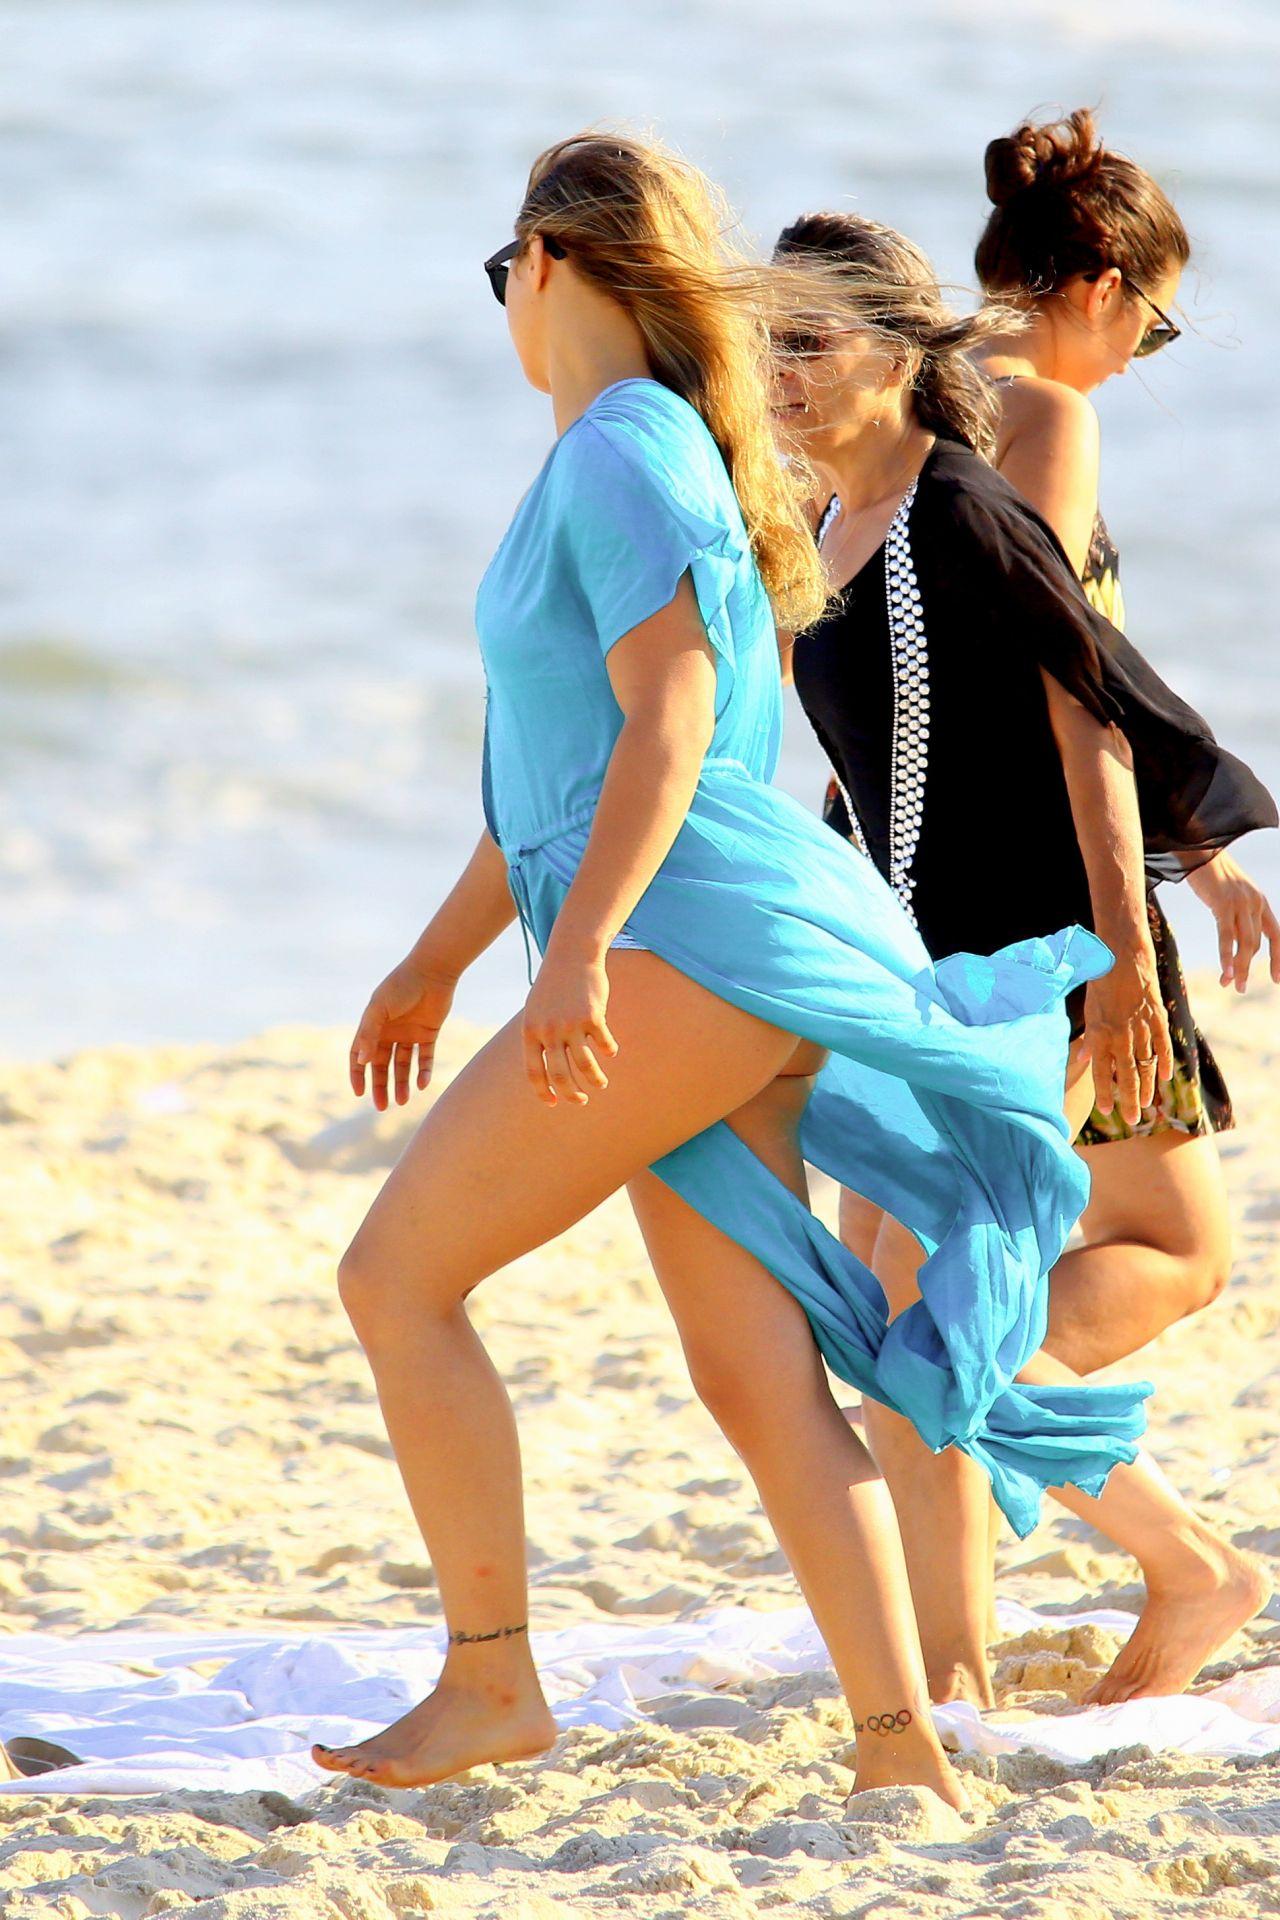 Ronda Rousey In A Bikini At A Beach In Rio De Janeiro